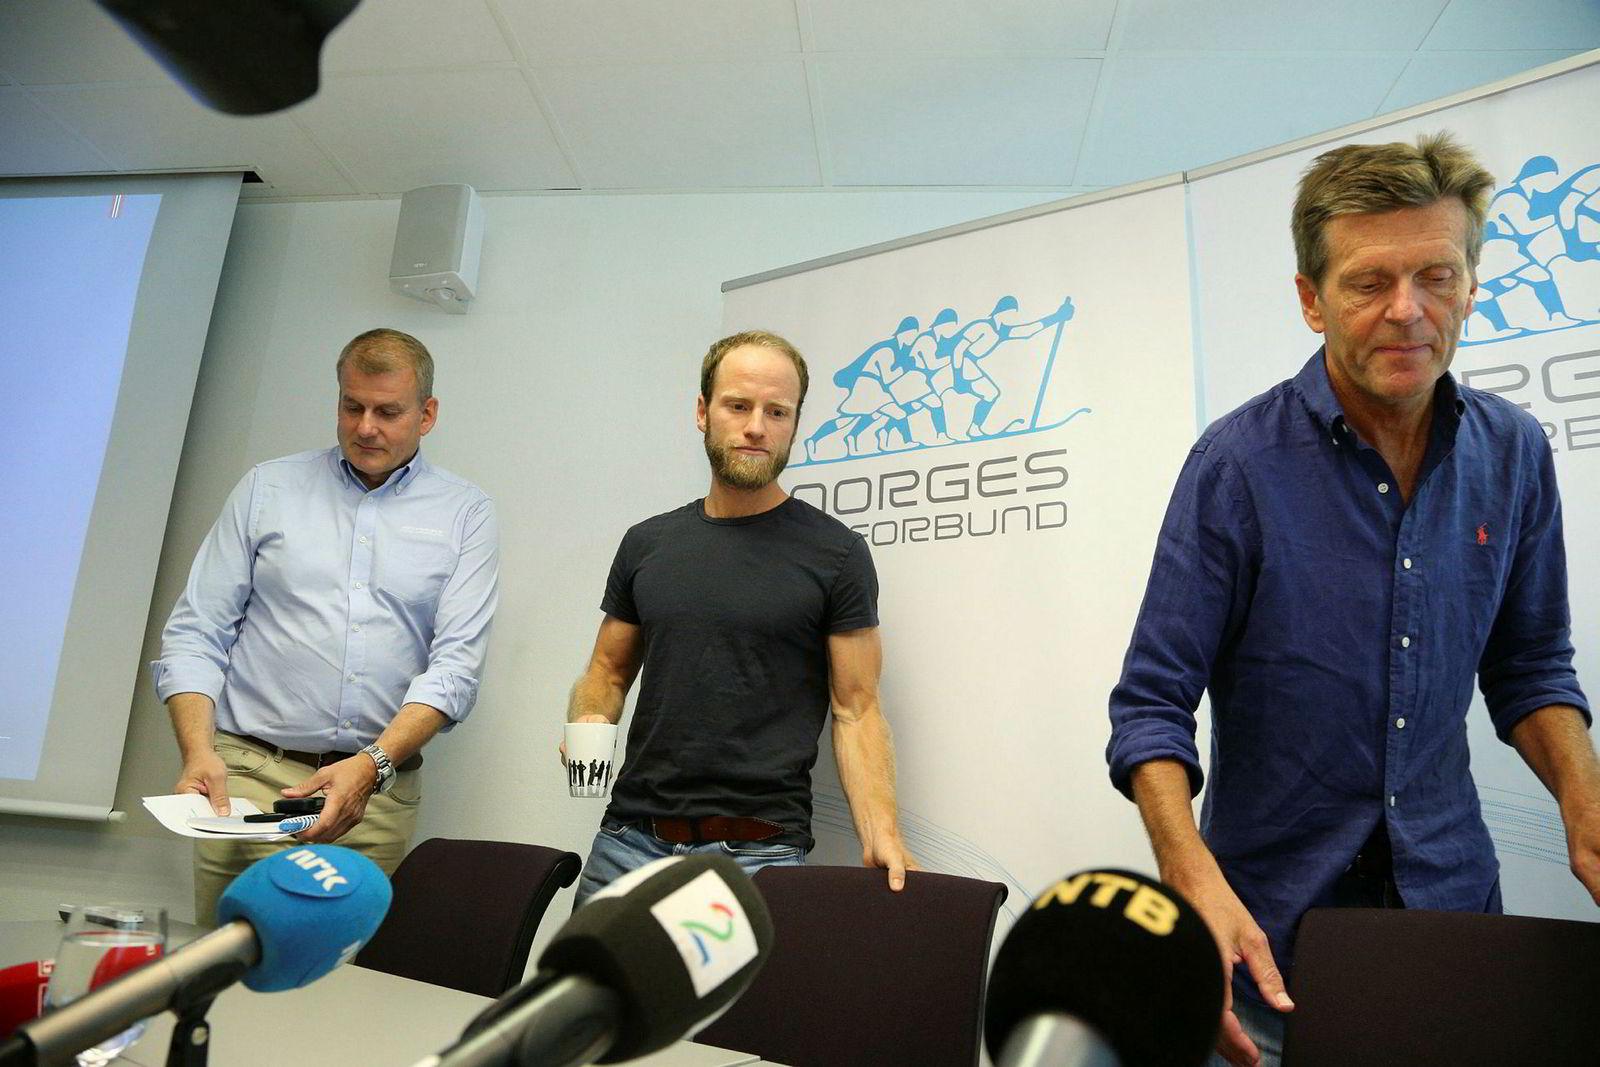 Martin Johnsrud Sundby sammen med skipresident Erik Røste (t.v.) og landslagslege Knut Gabrielsen (t.h) under pressekonferansen da utestengelsen fra idretten ble offentliggjort 20. juli 2016.